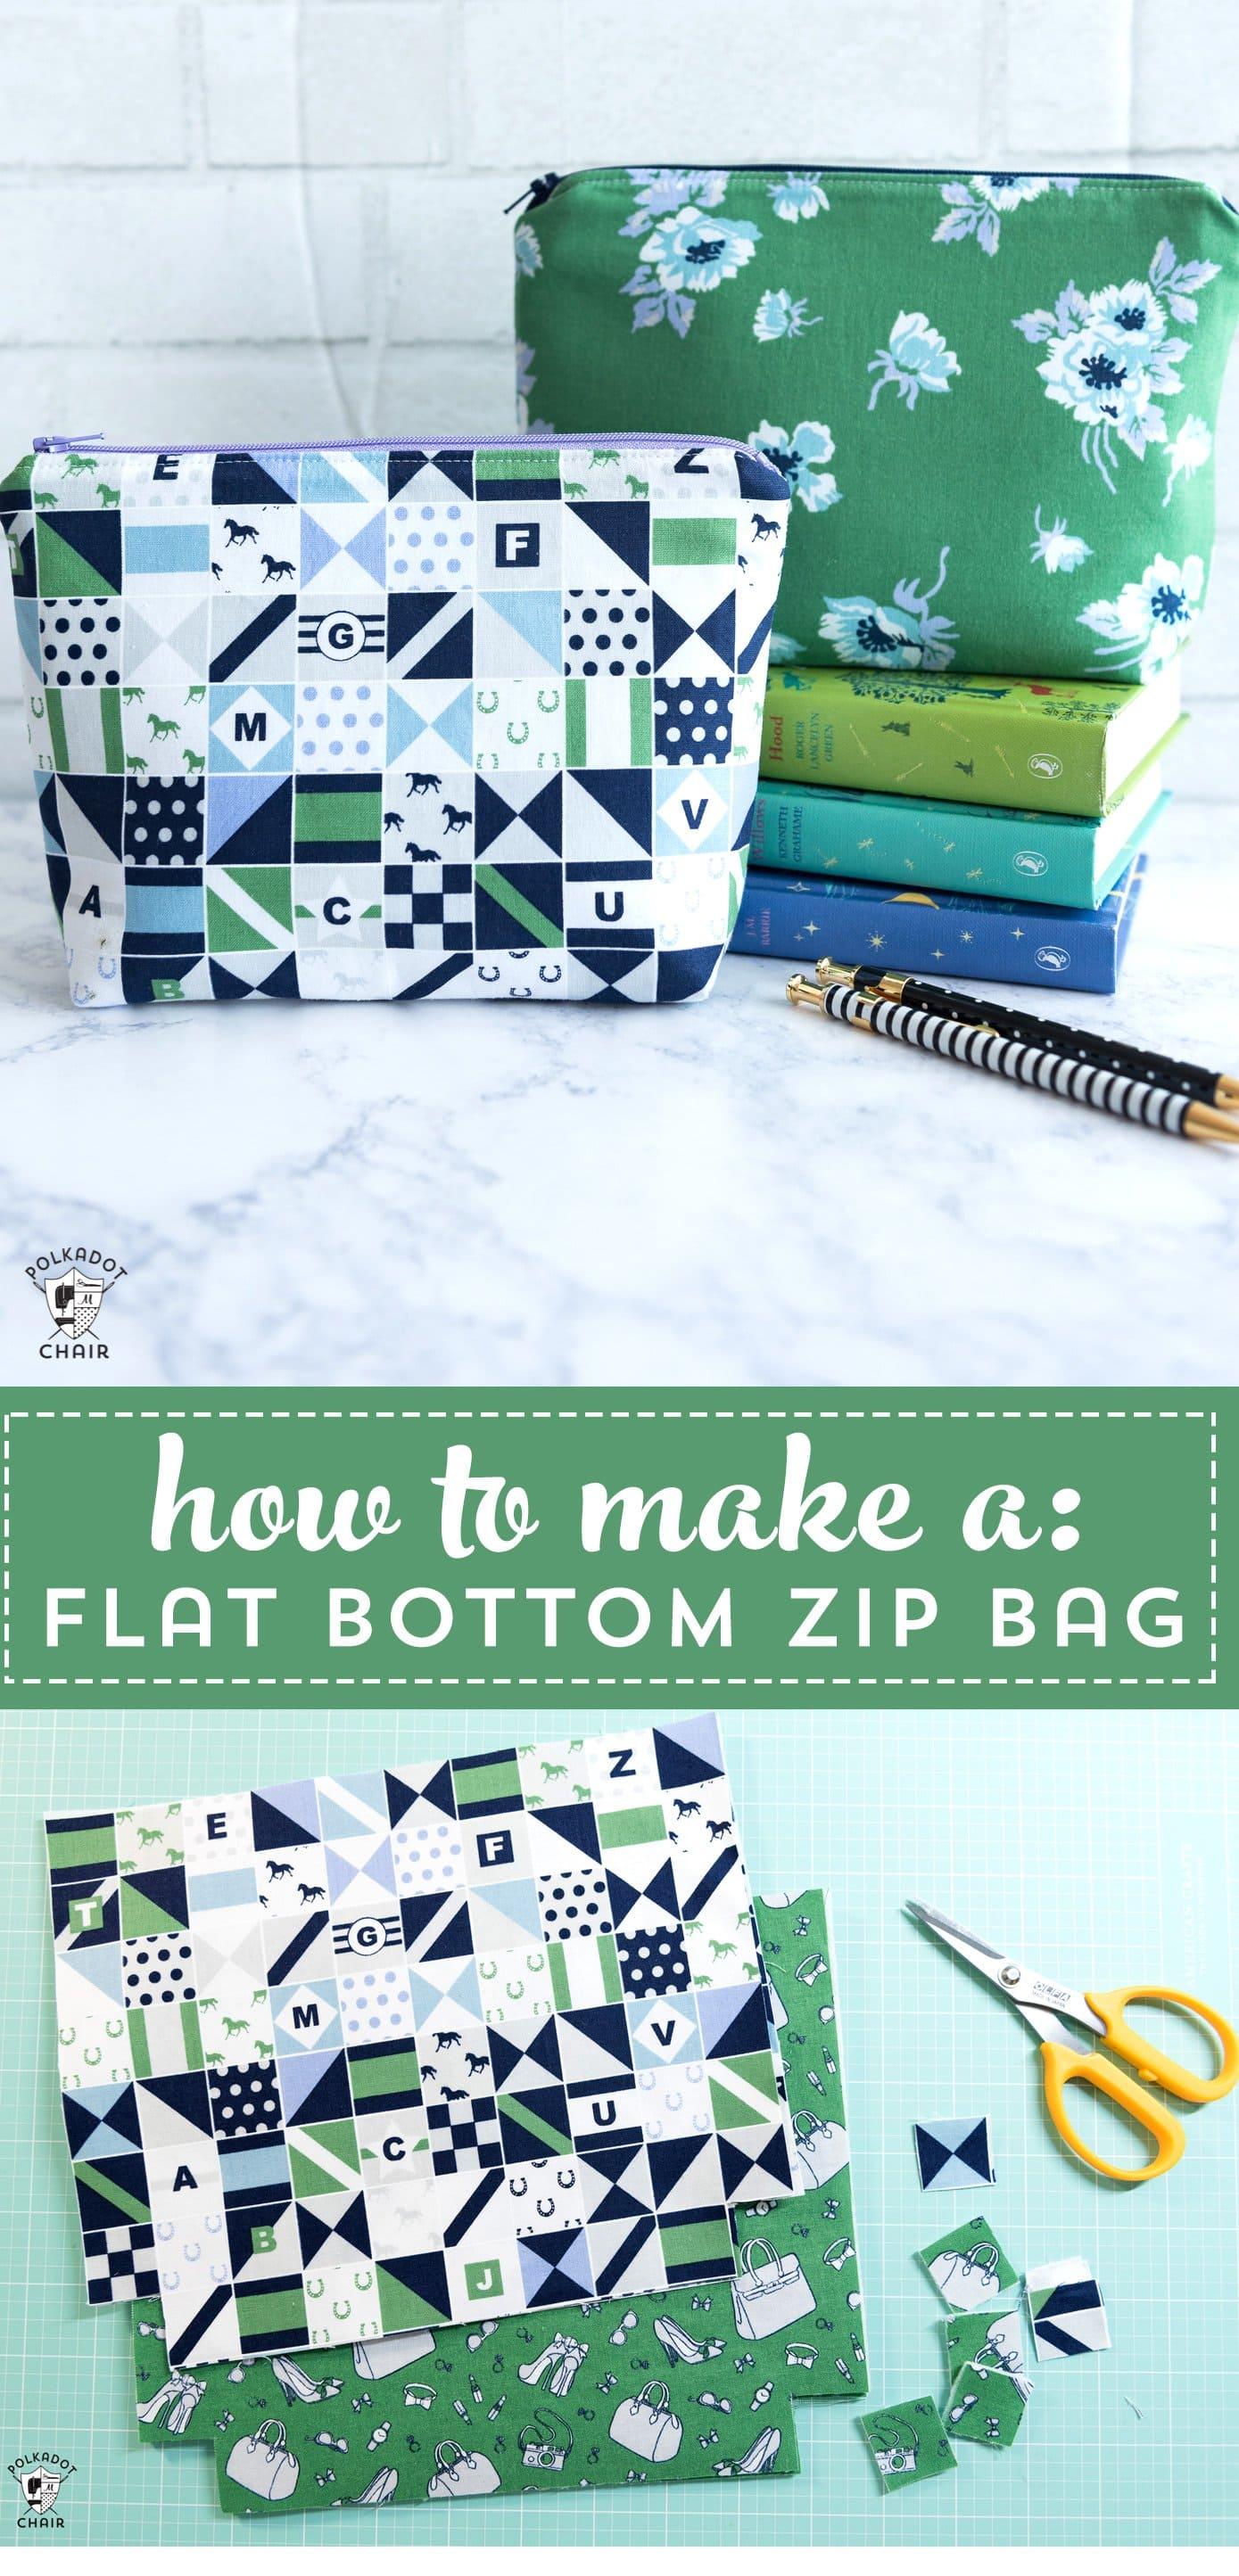 sew-a-flat-bottom-zip-bag.jpg